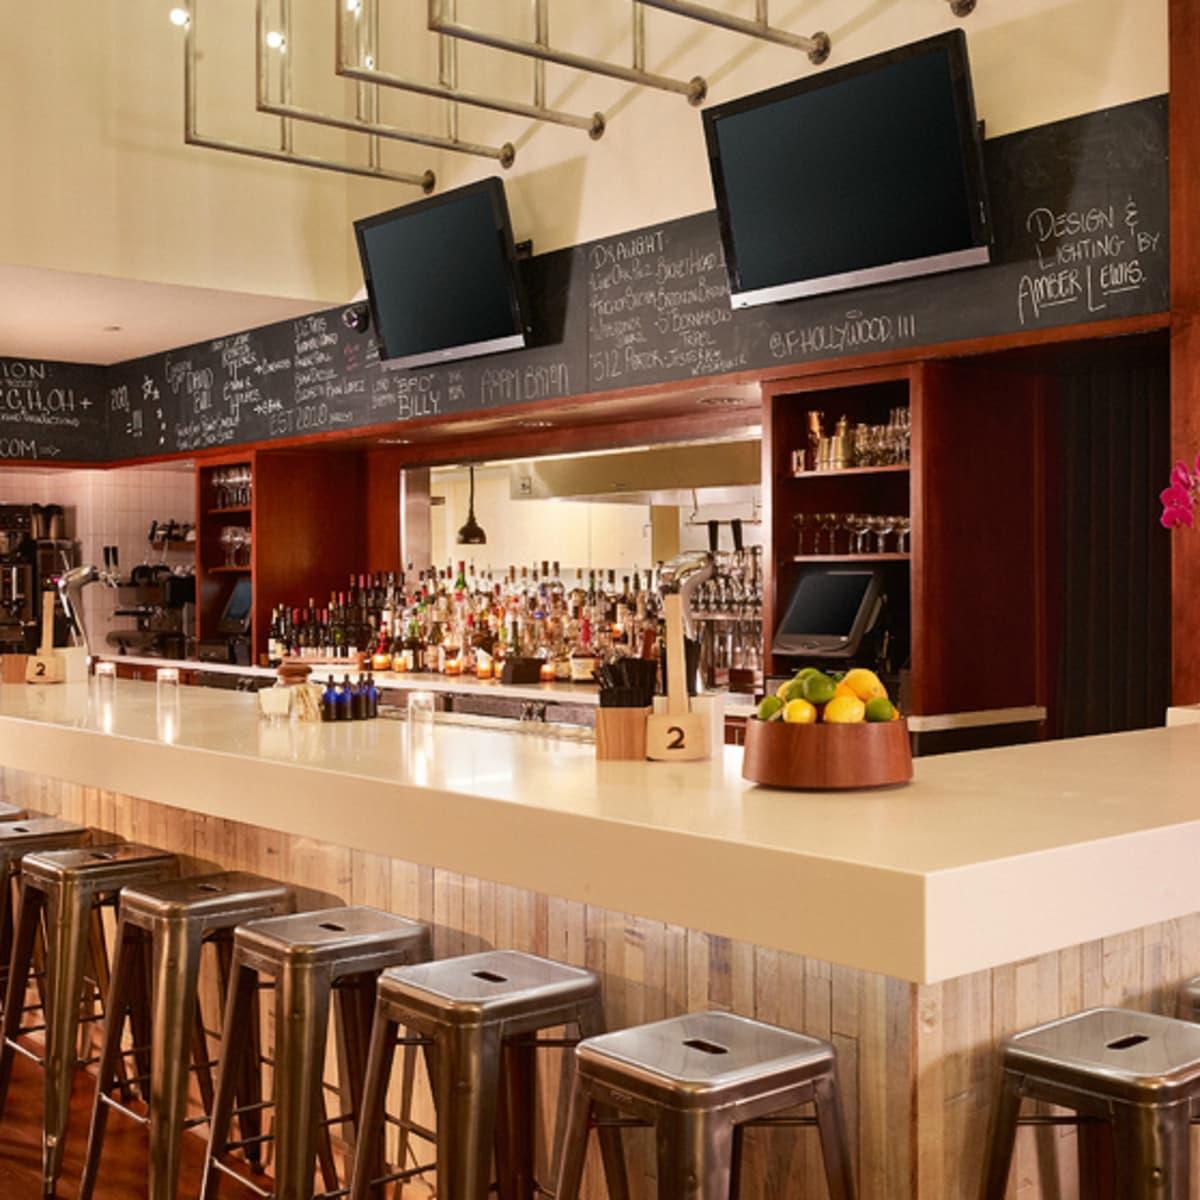 Second Bar and Kitchen interior